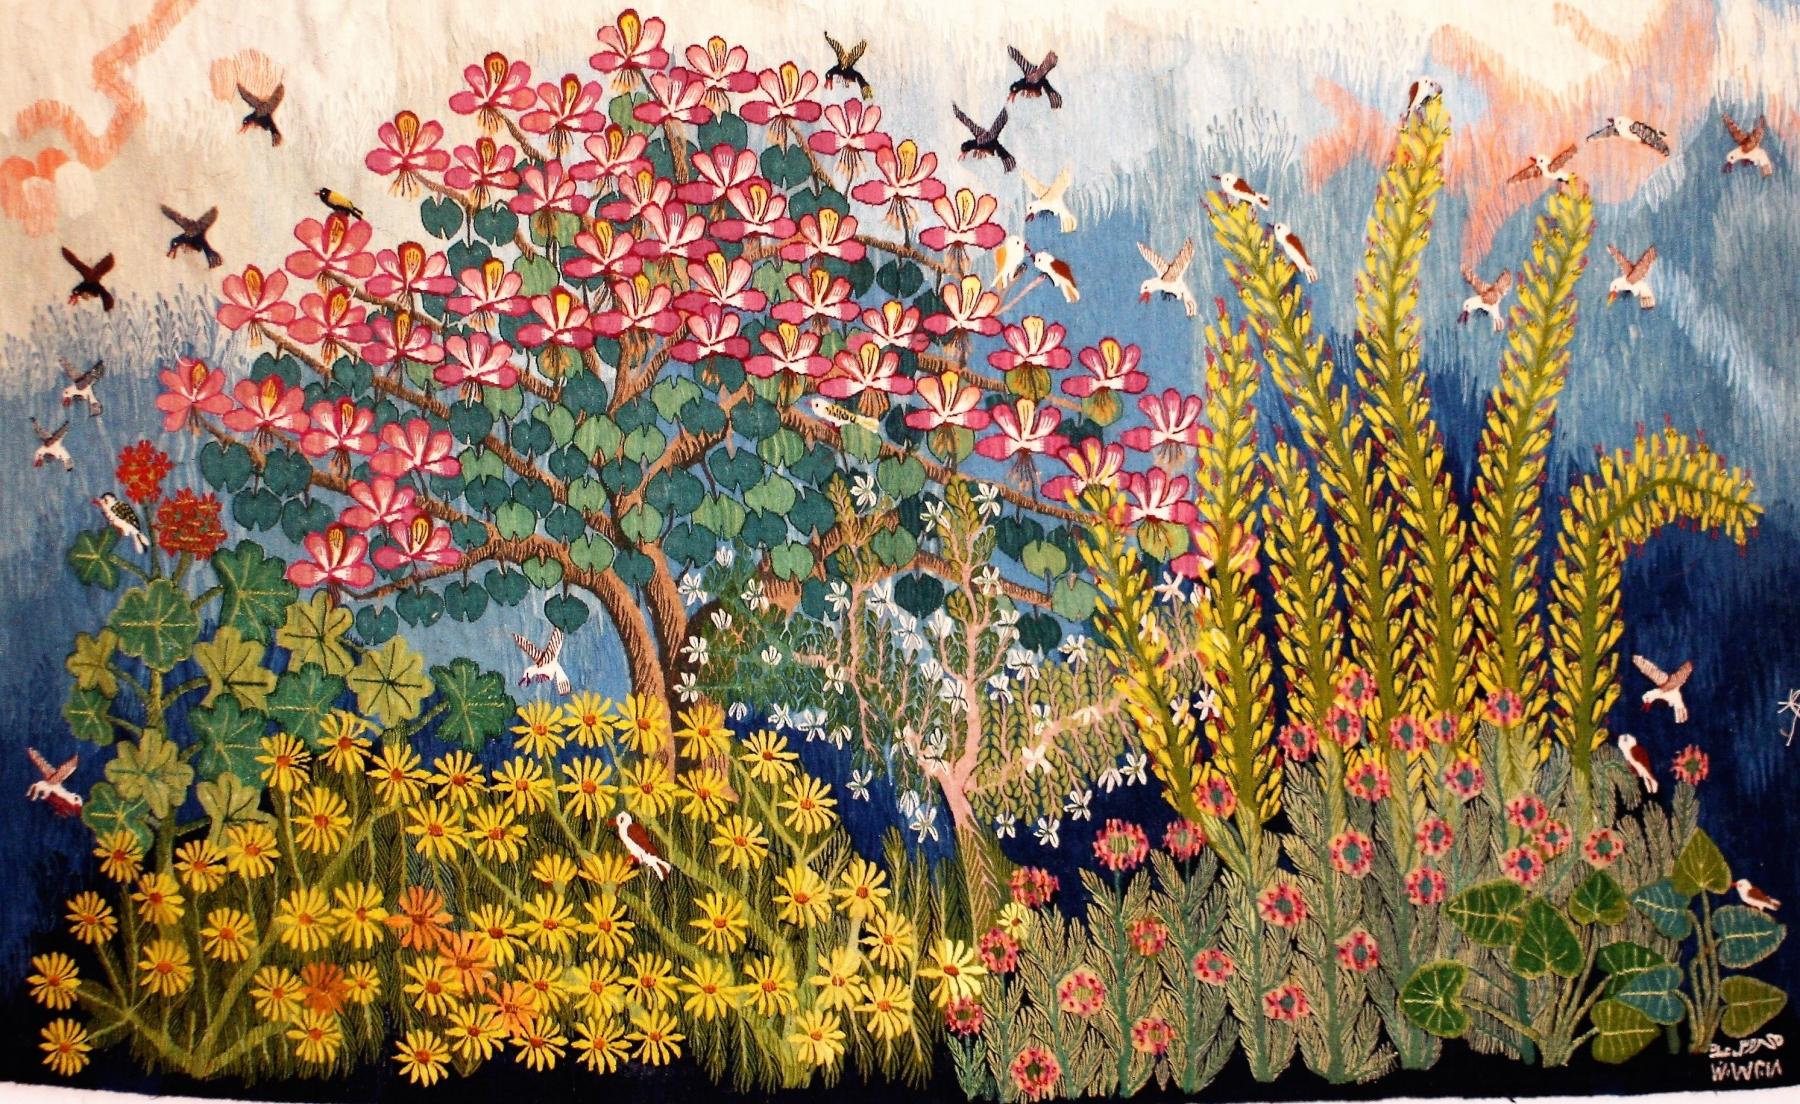 2-Bauhinia-in-the-garden-2018-178-2.04-x-1.23-m-Mahrous-Abdou